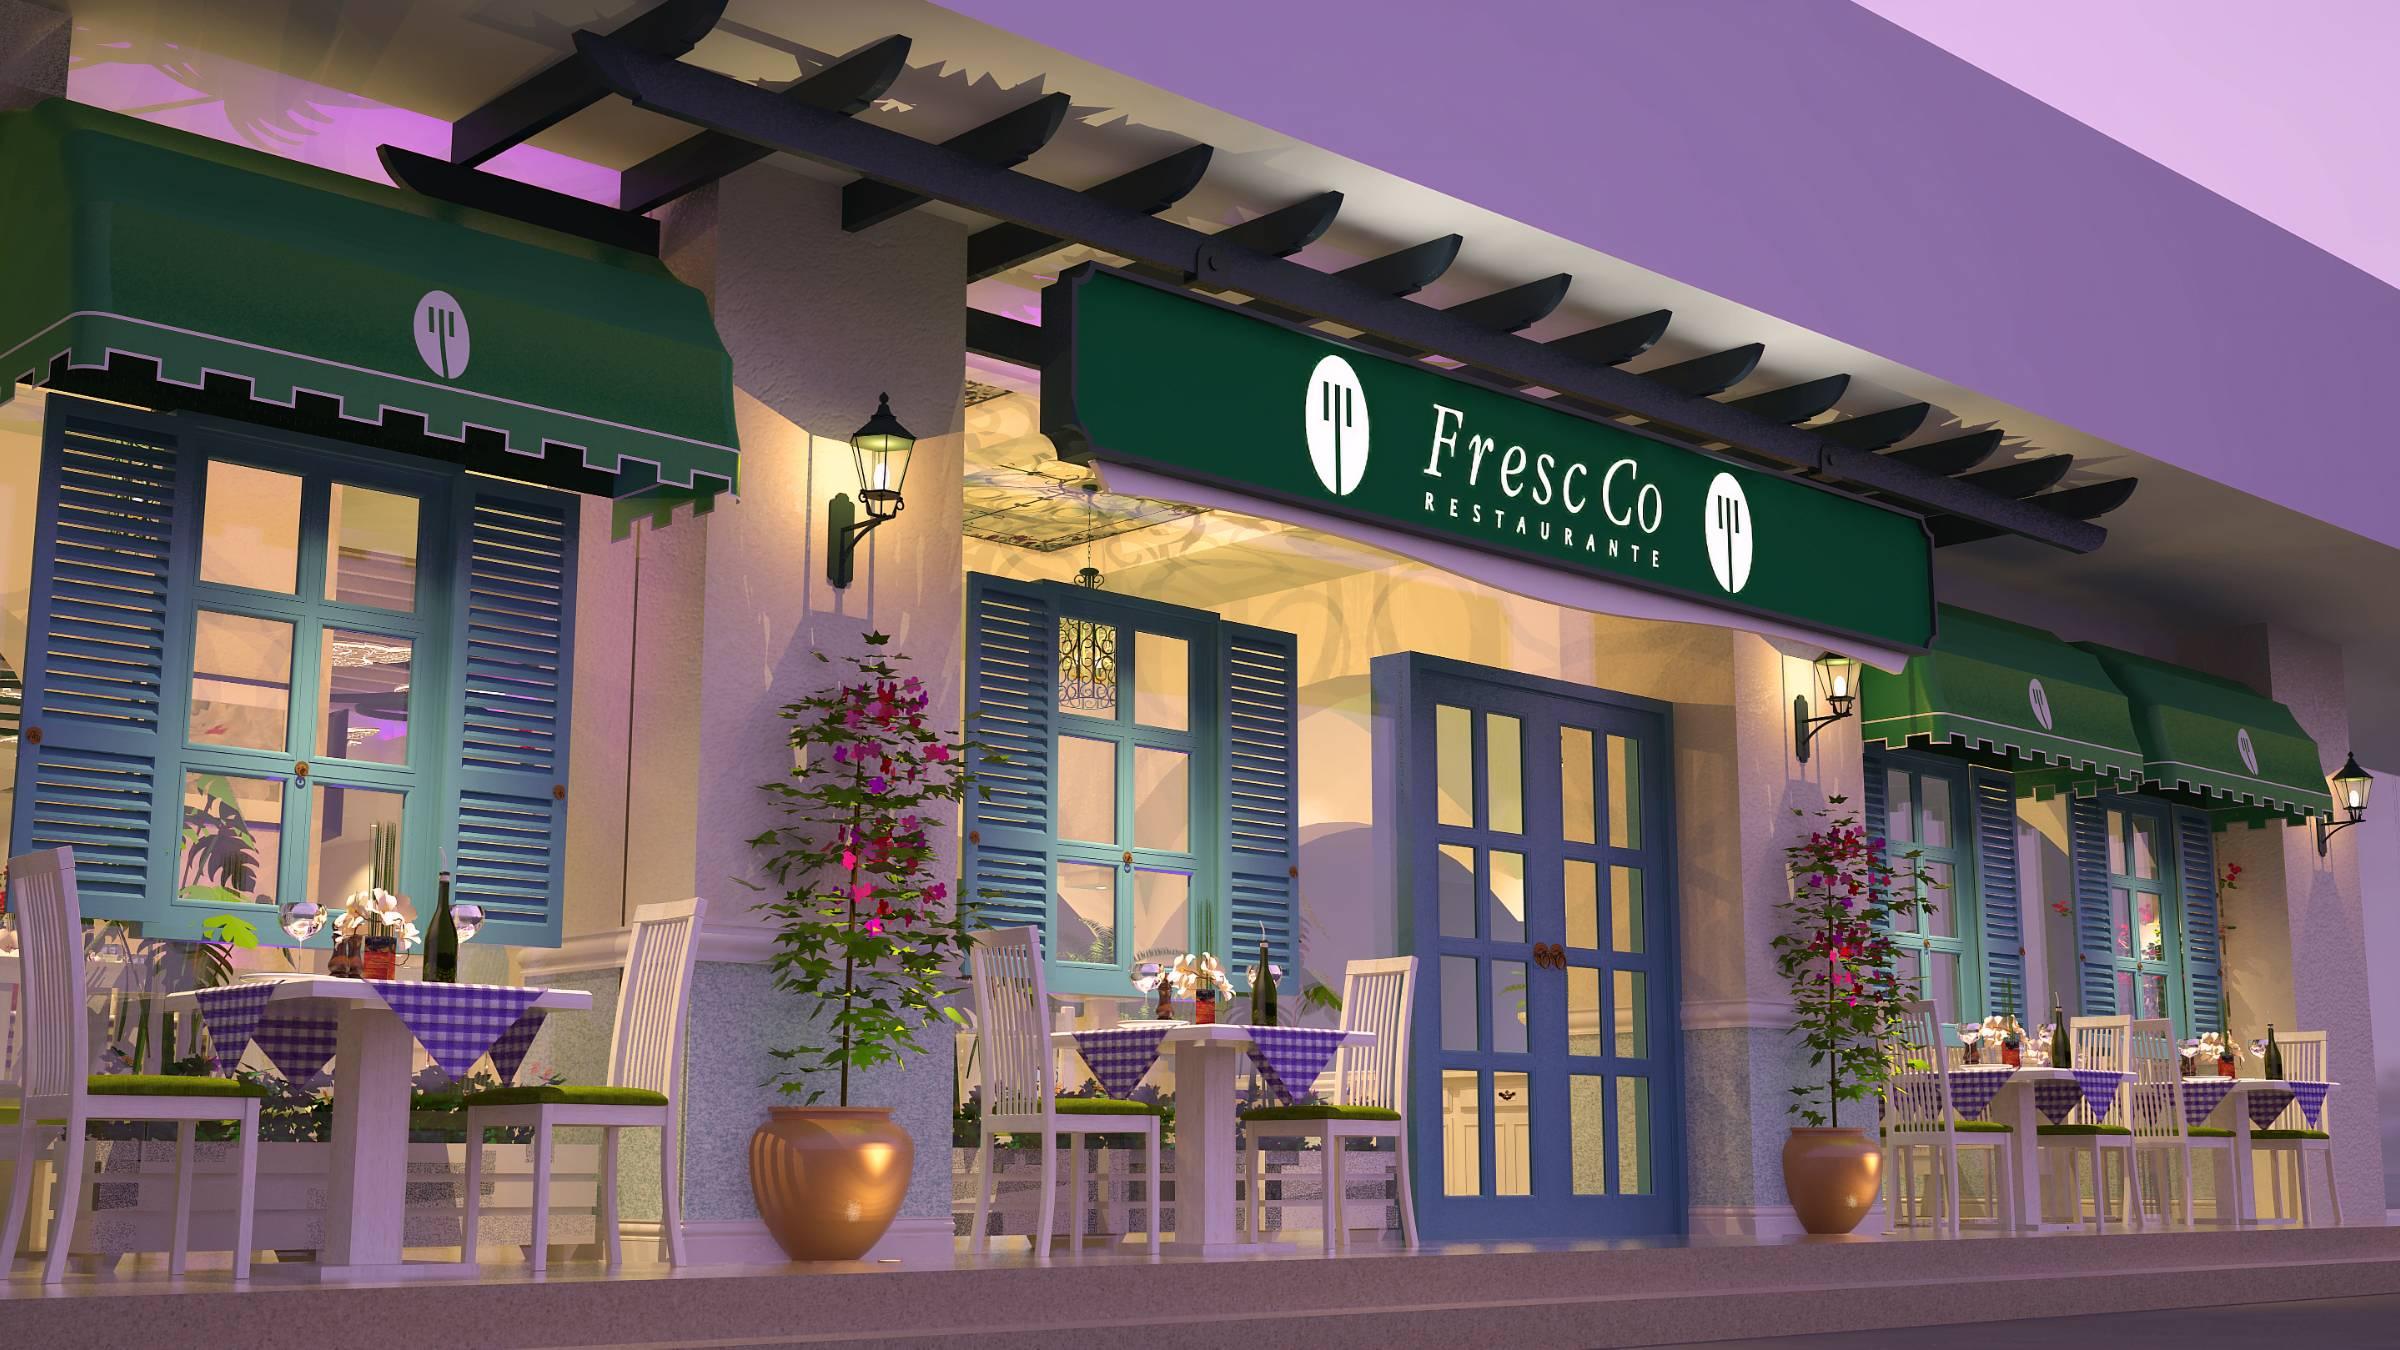 Fresco fine dining restaurant facade view